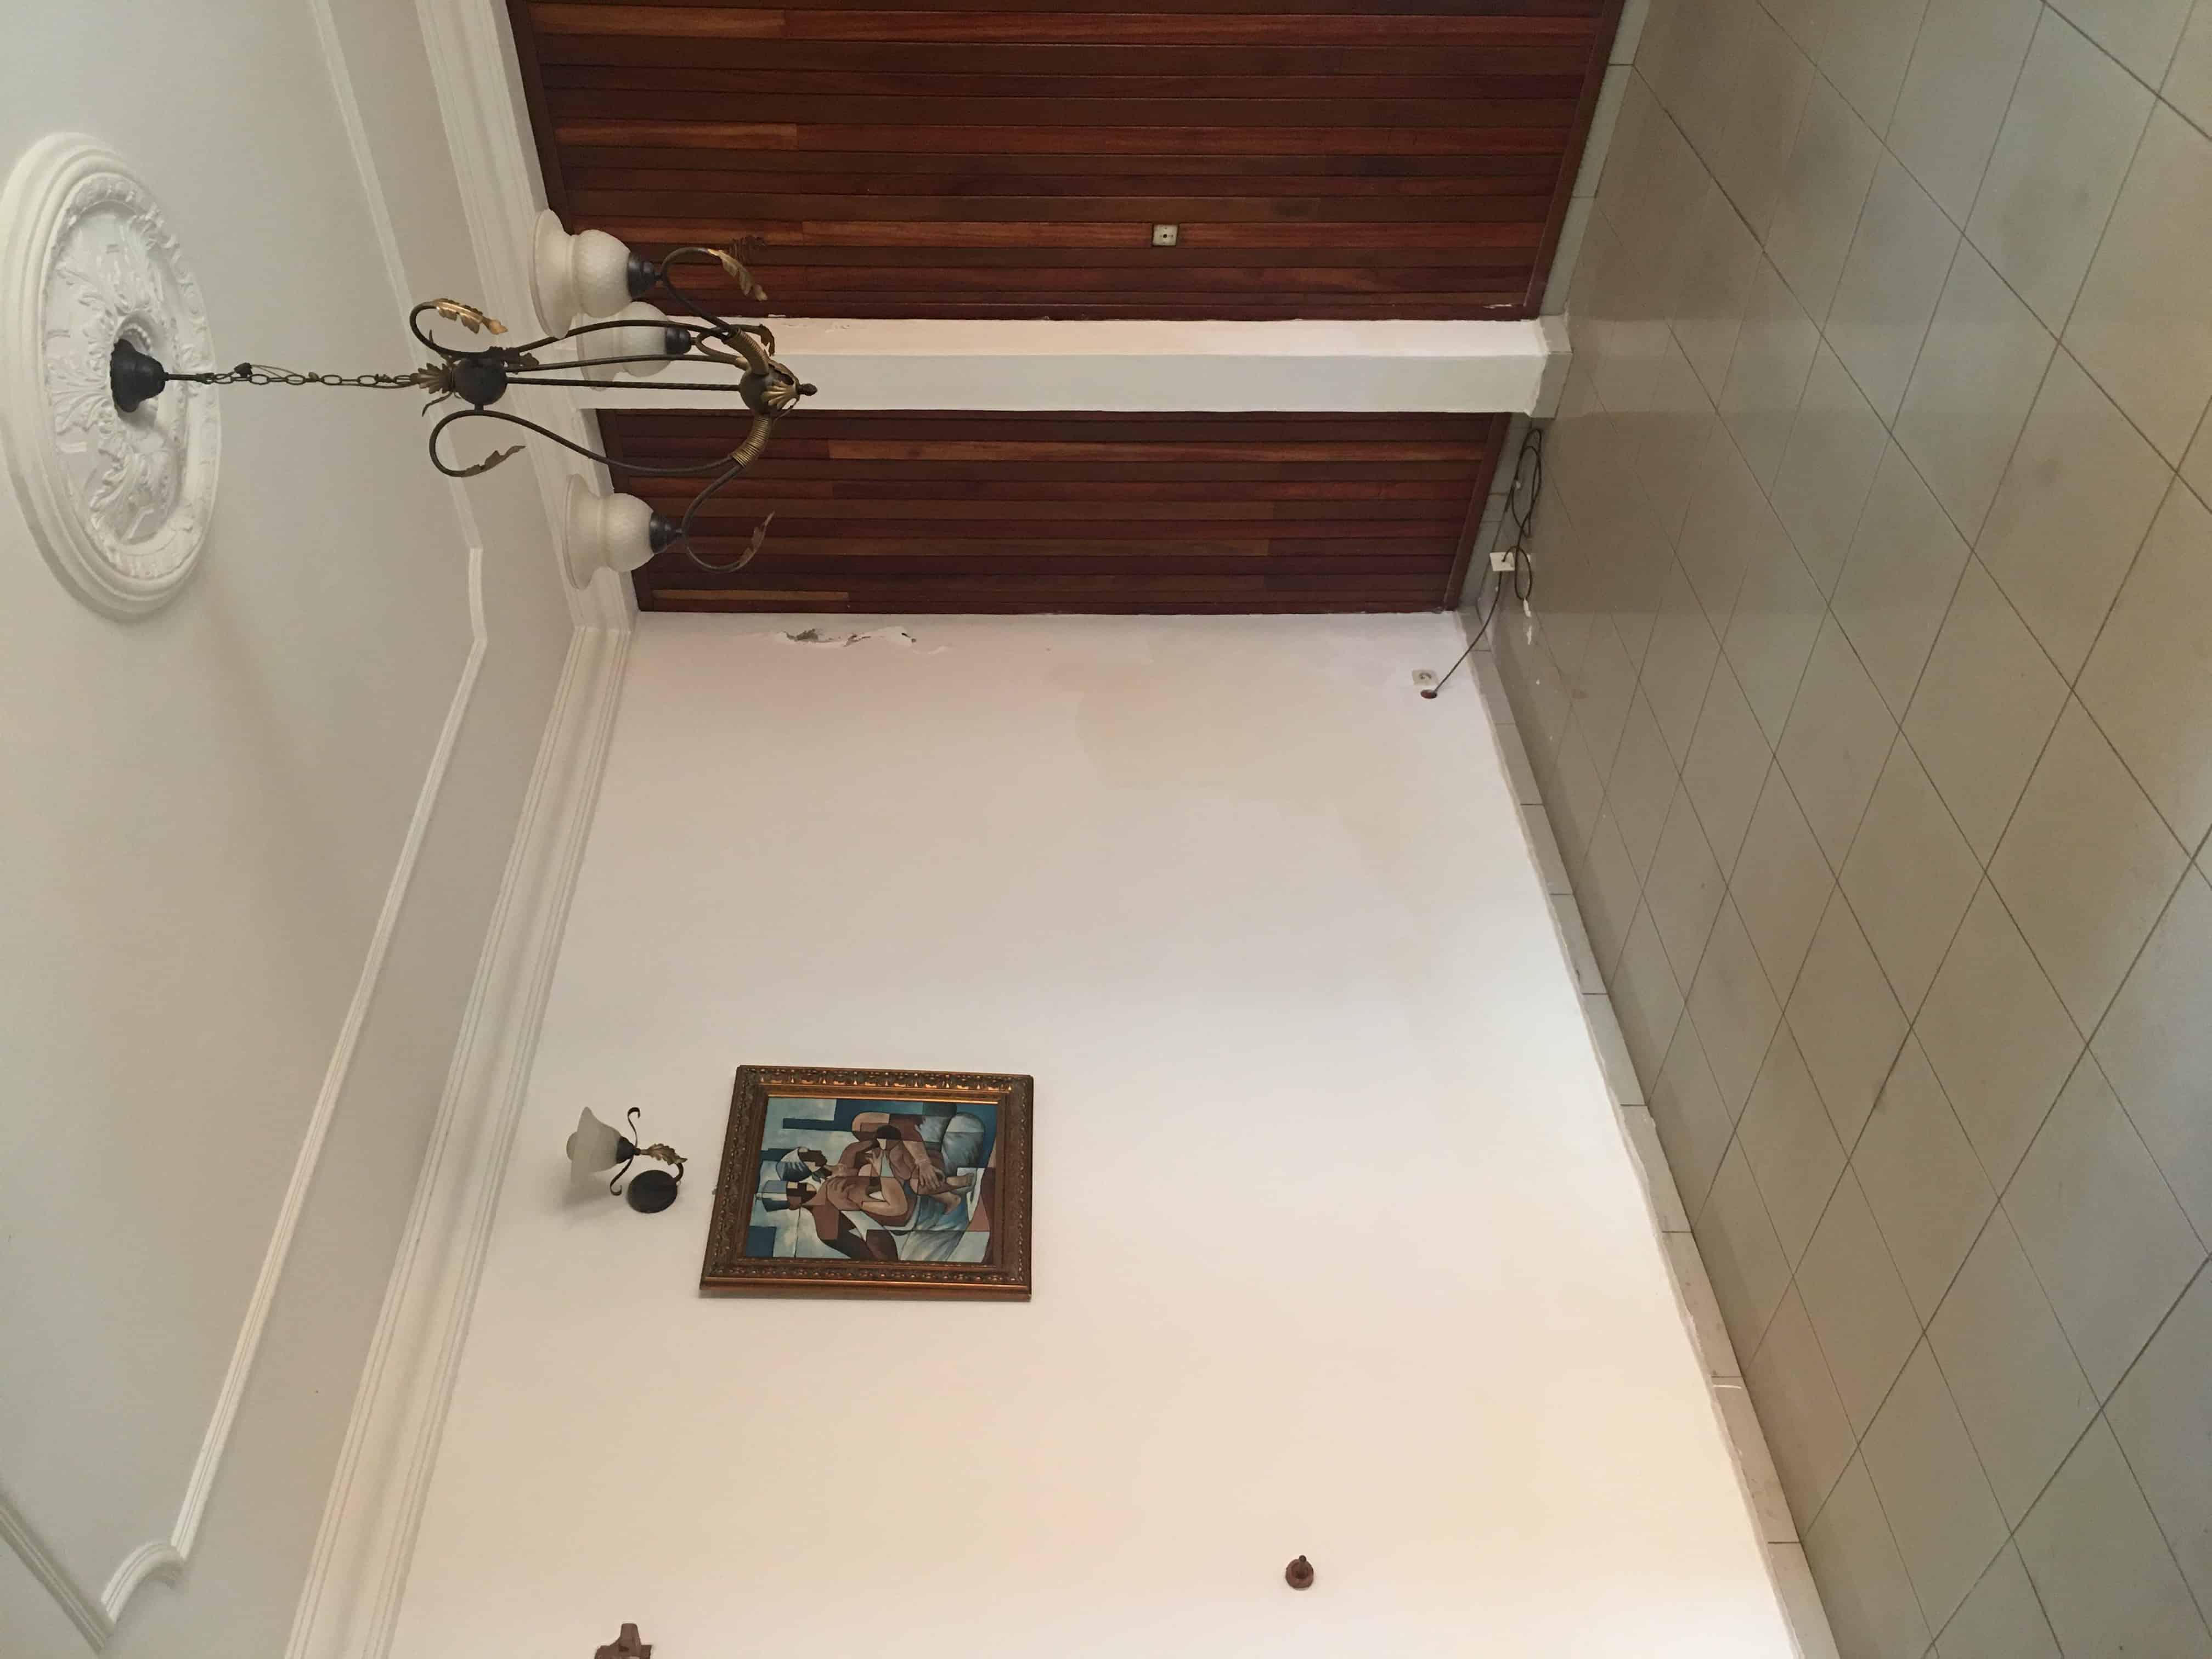 Apartment to rent - Yaoundé, Tsinga, Fecafoot - 1 living room(s), 2 bedroom(s), 1 bathroom(s) - 250 000 FCFA / month